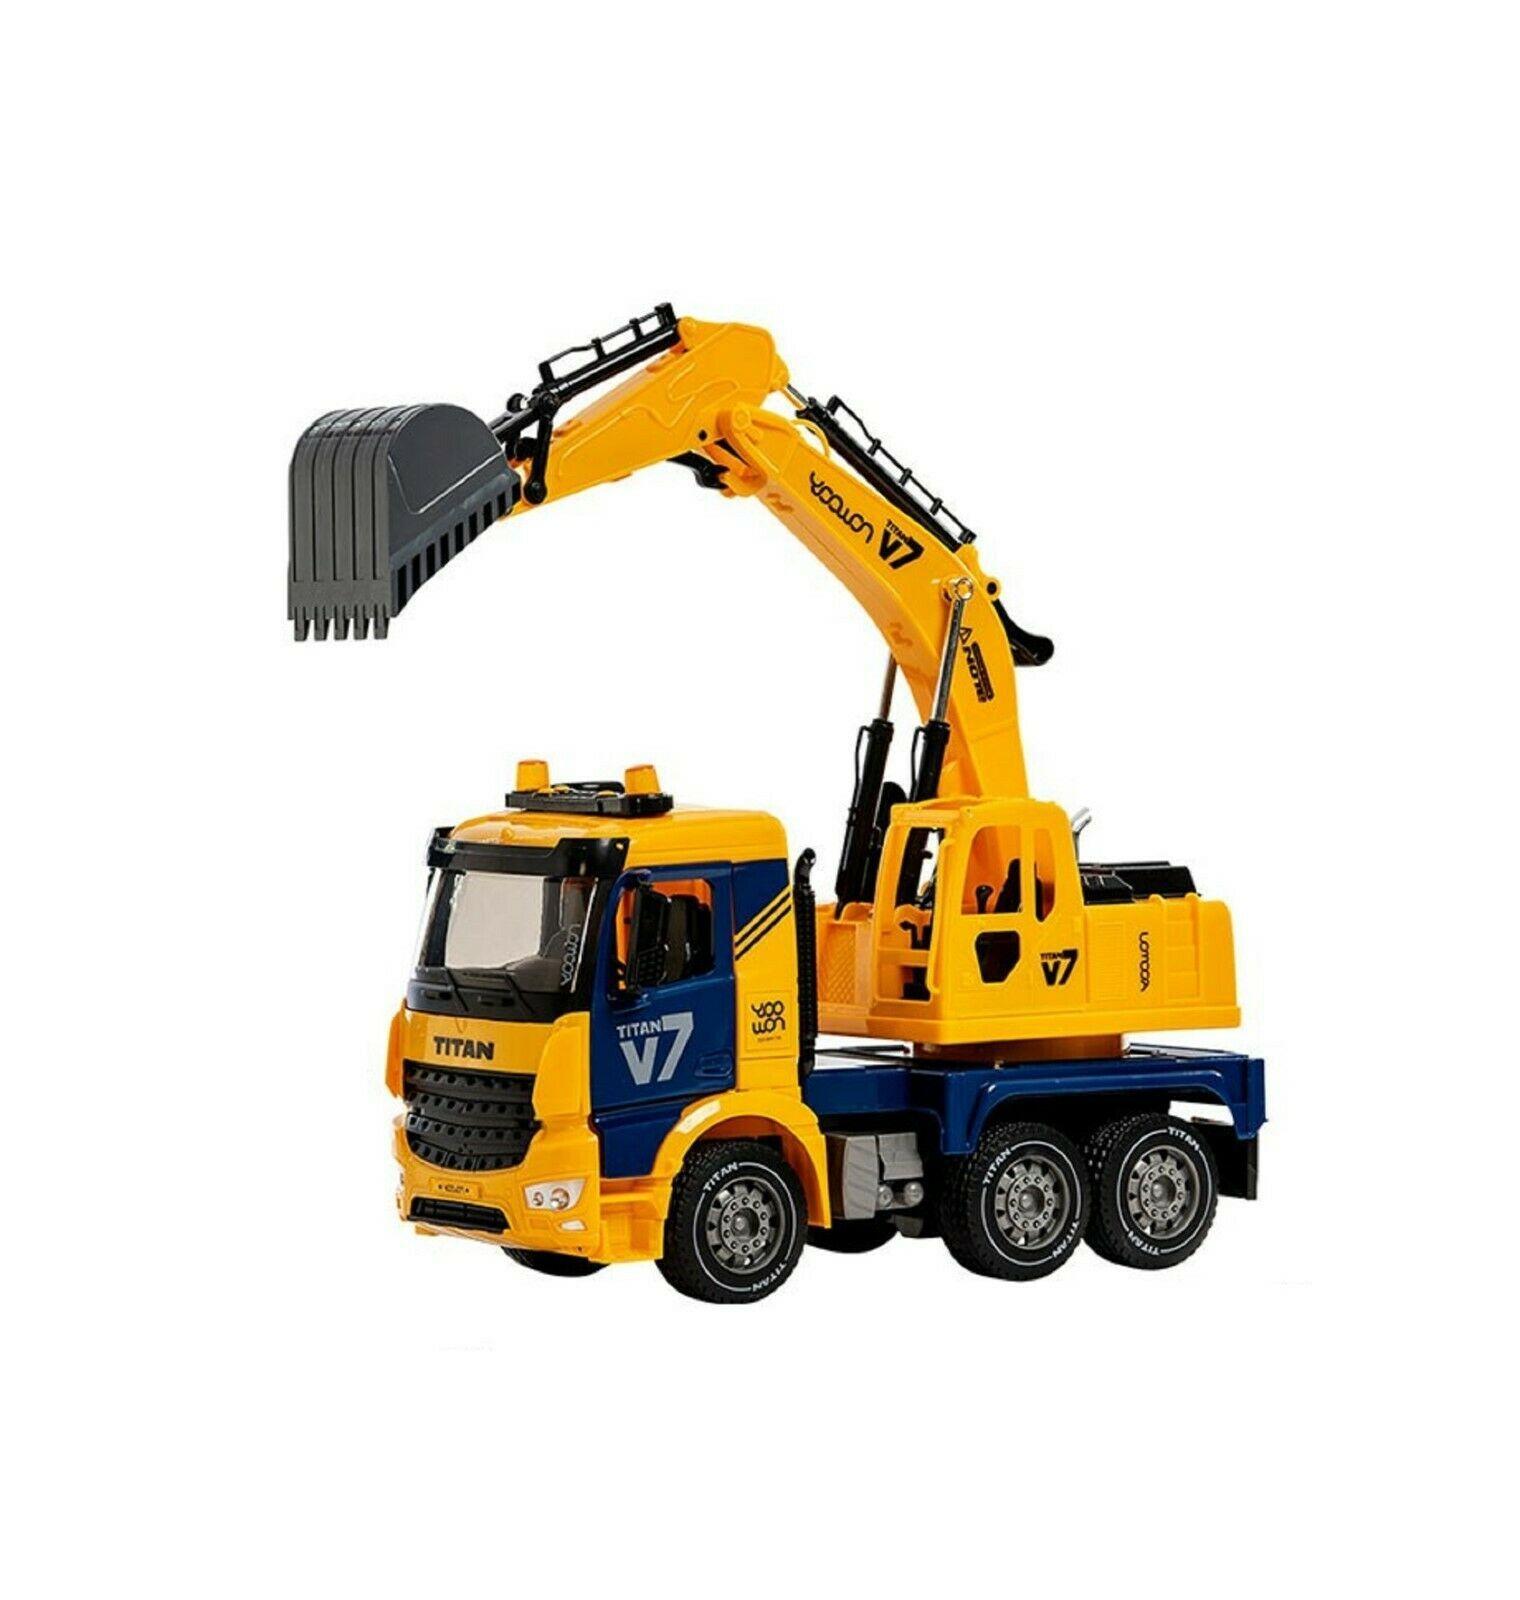 Yoowon Toys Titan Excavator Truck Sound Lights Vehicle Heavy Equipment Toy Car